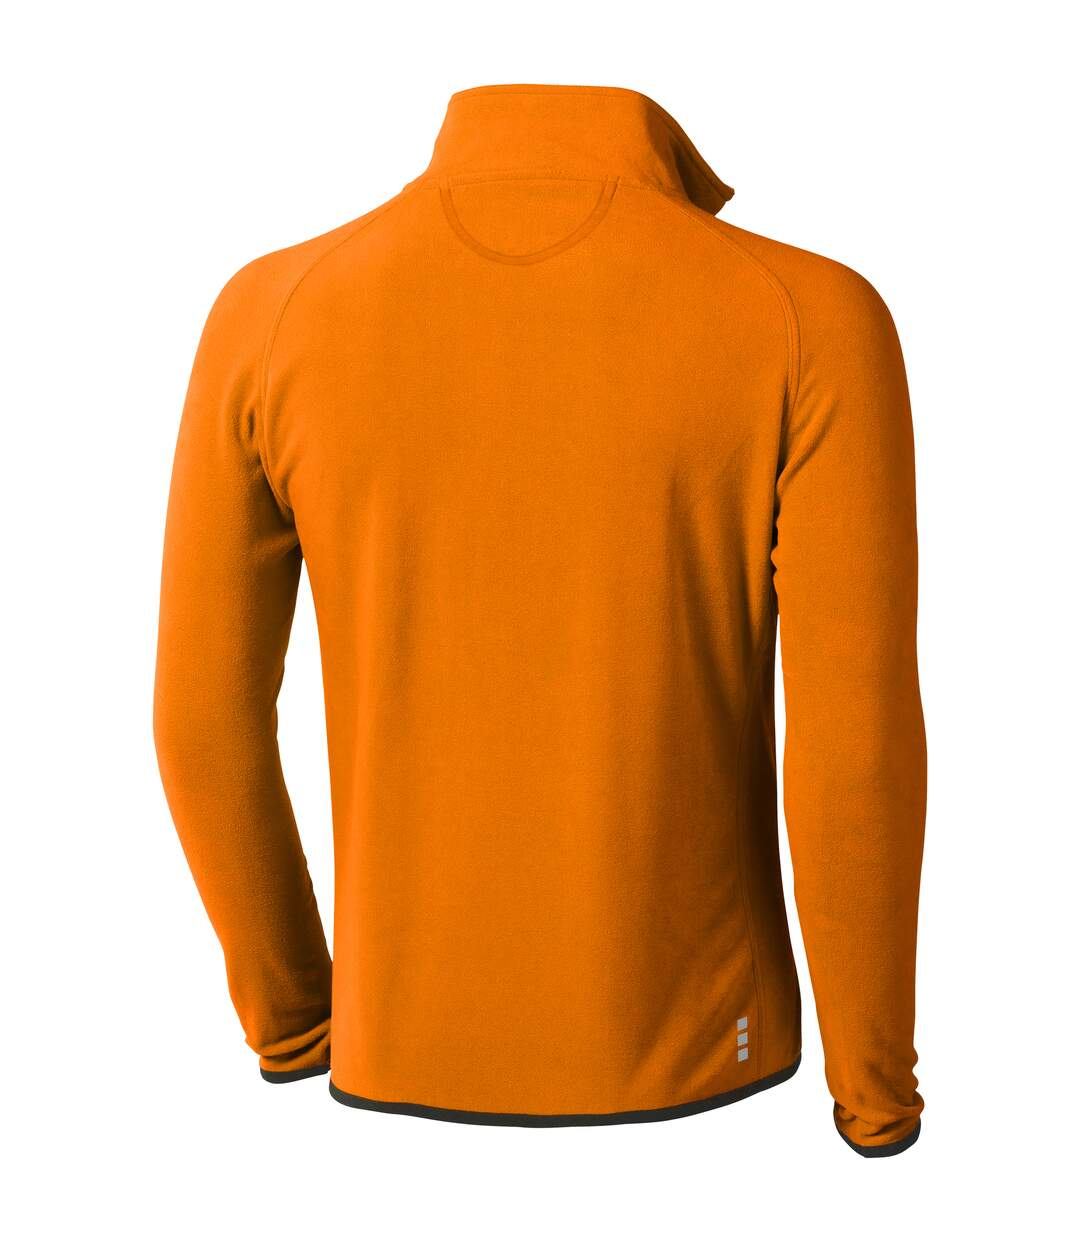 Elevate Brossard - Polaire zippée - Homme (Orange) - UTPF1944